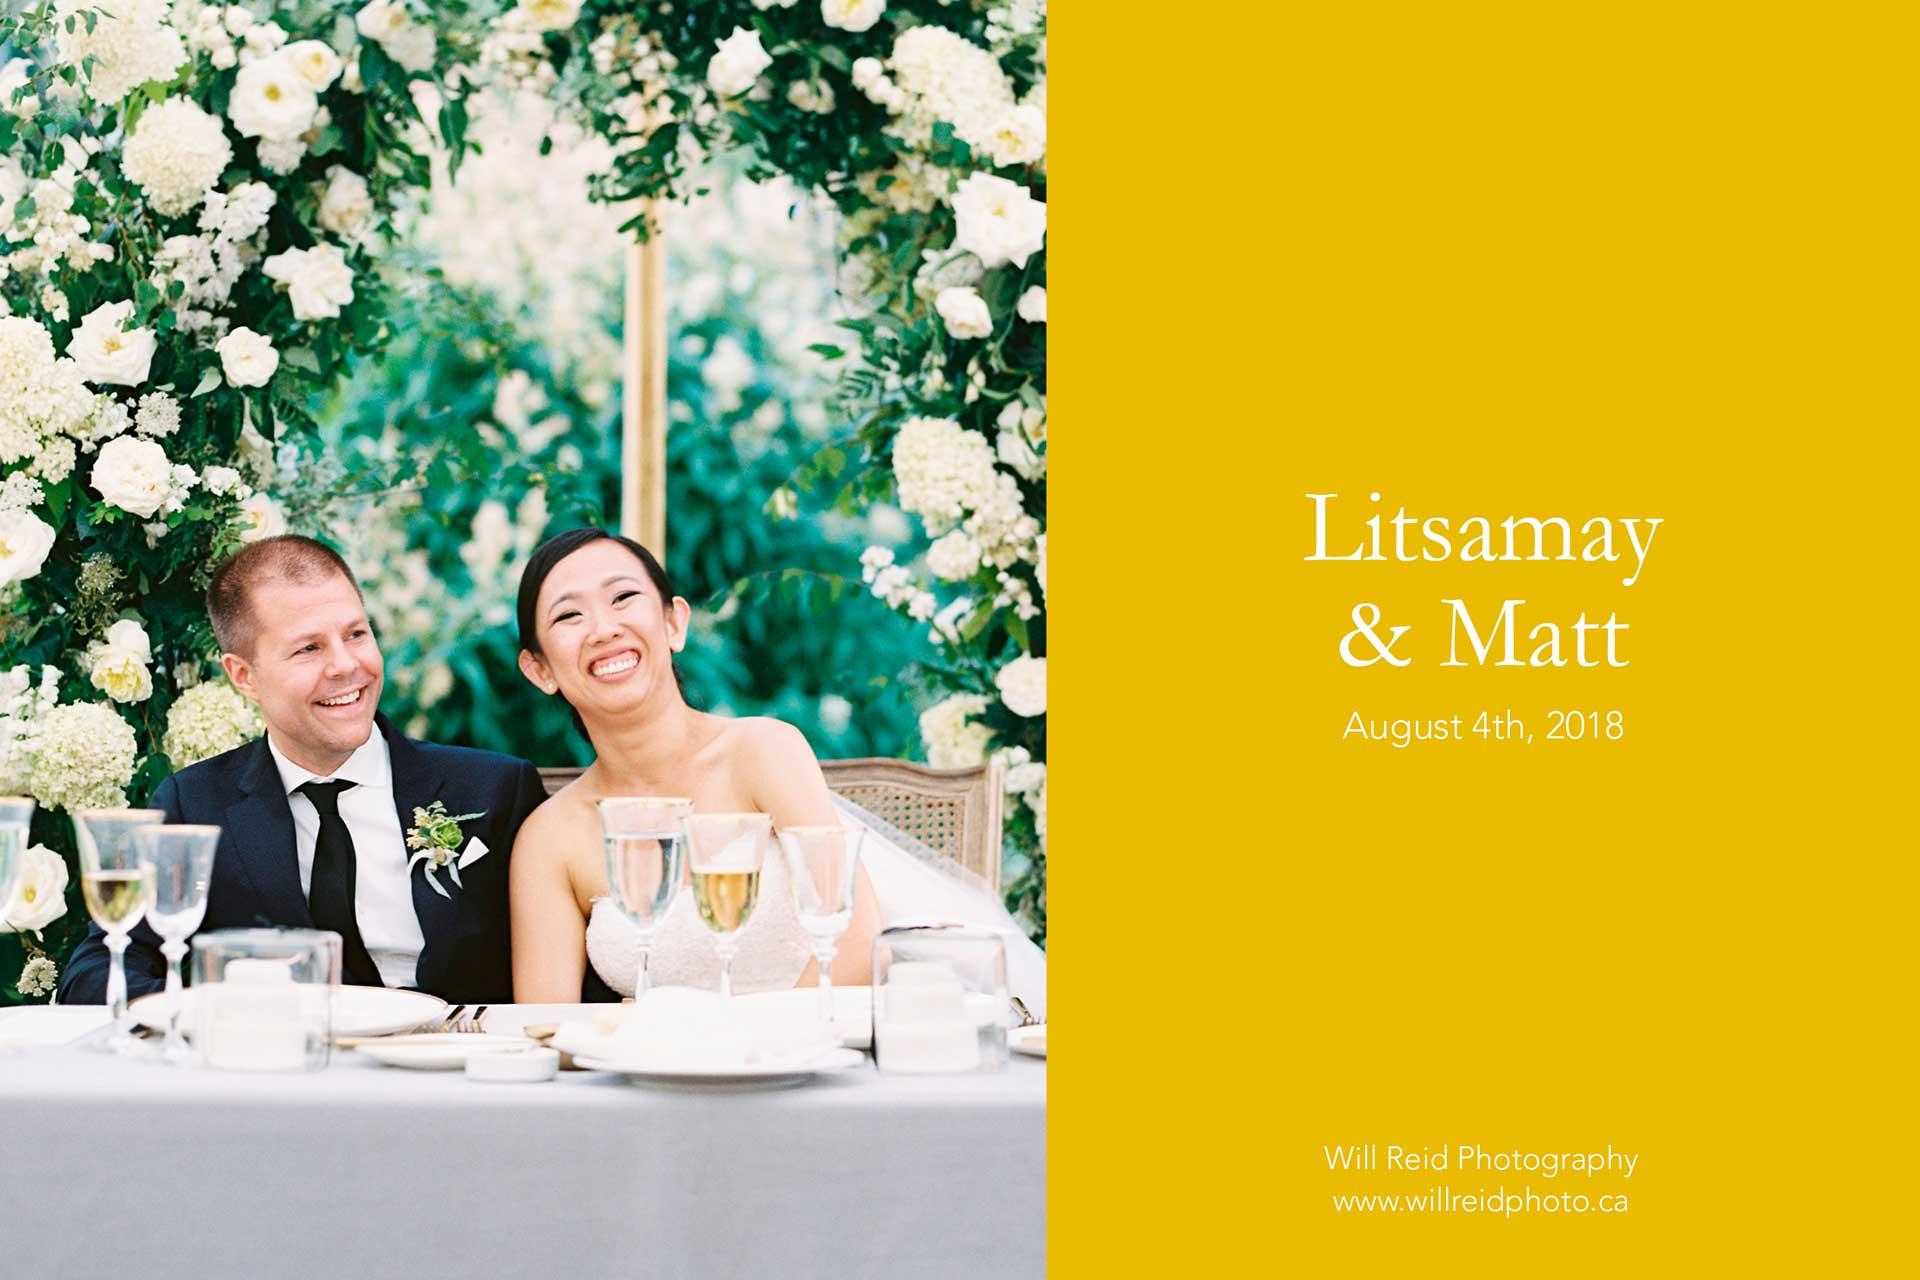 Litsamay and Matt's Wedding